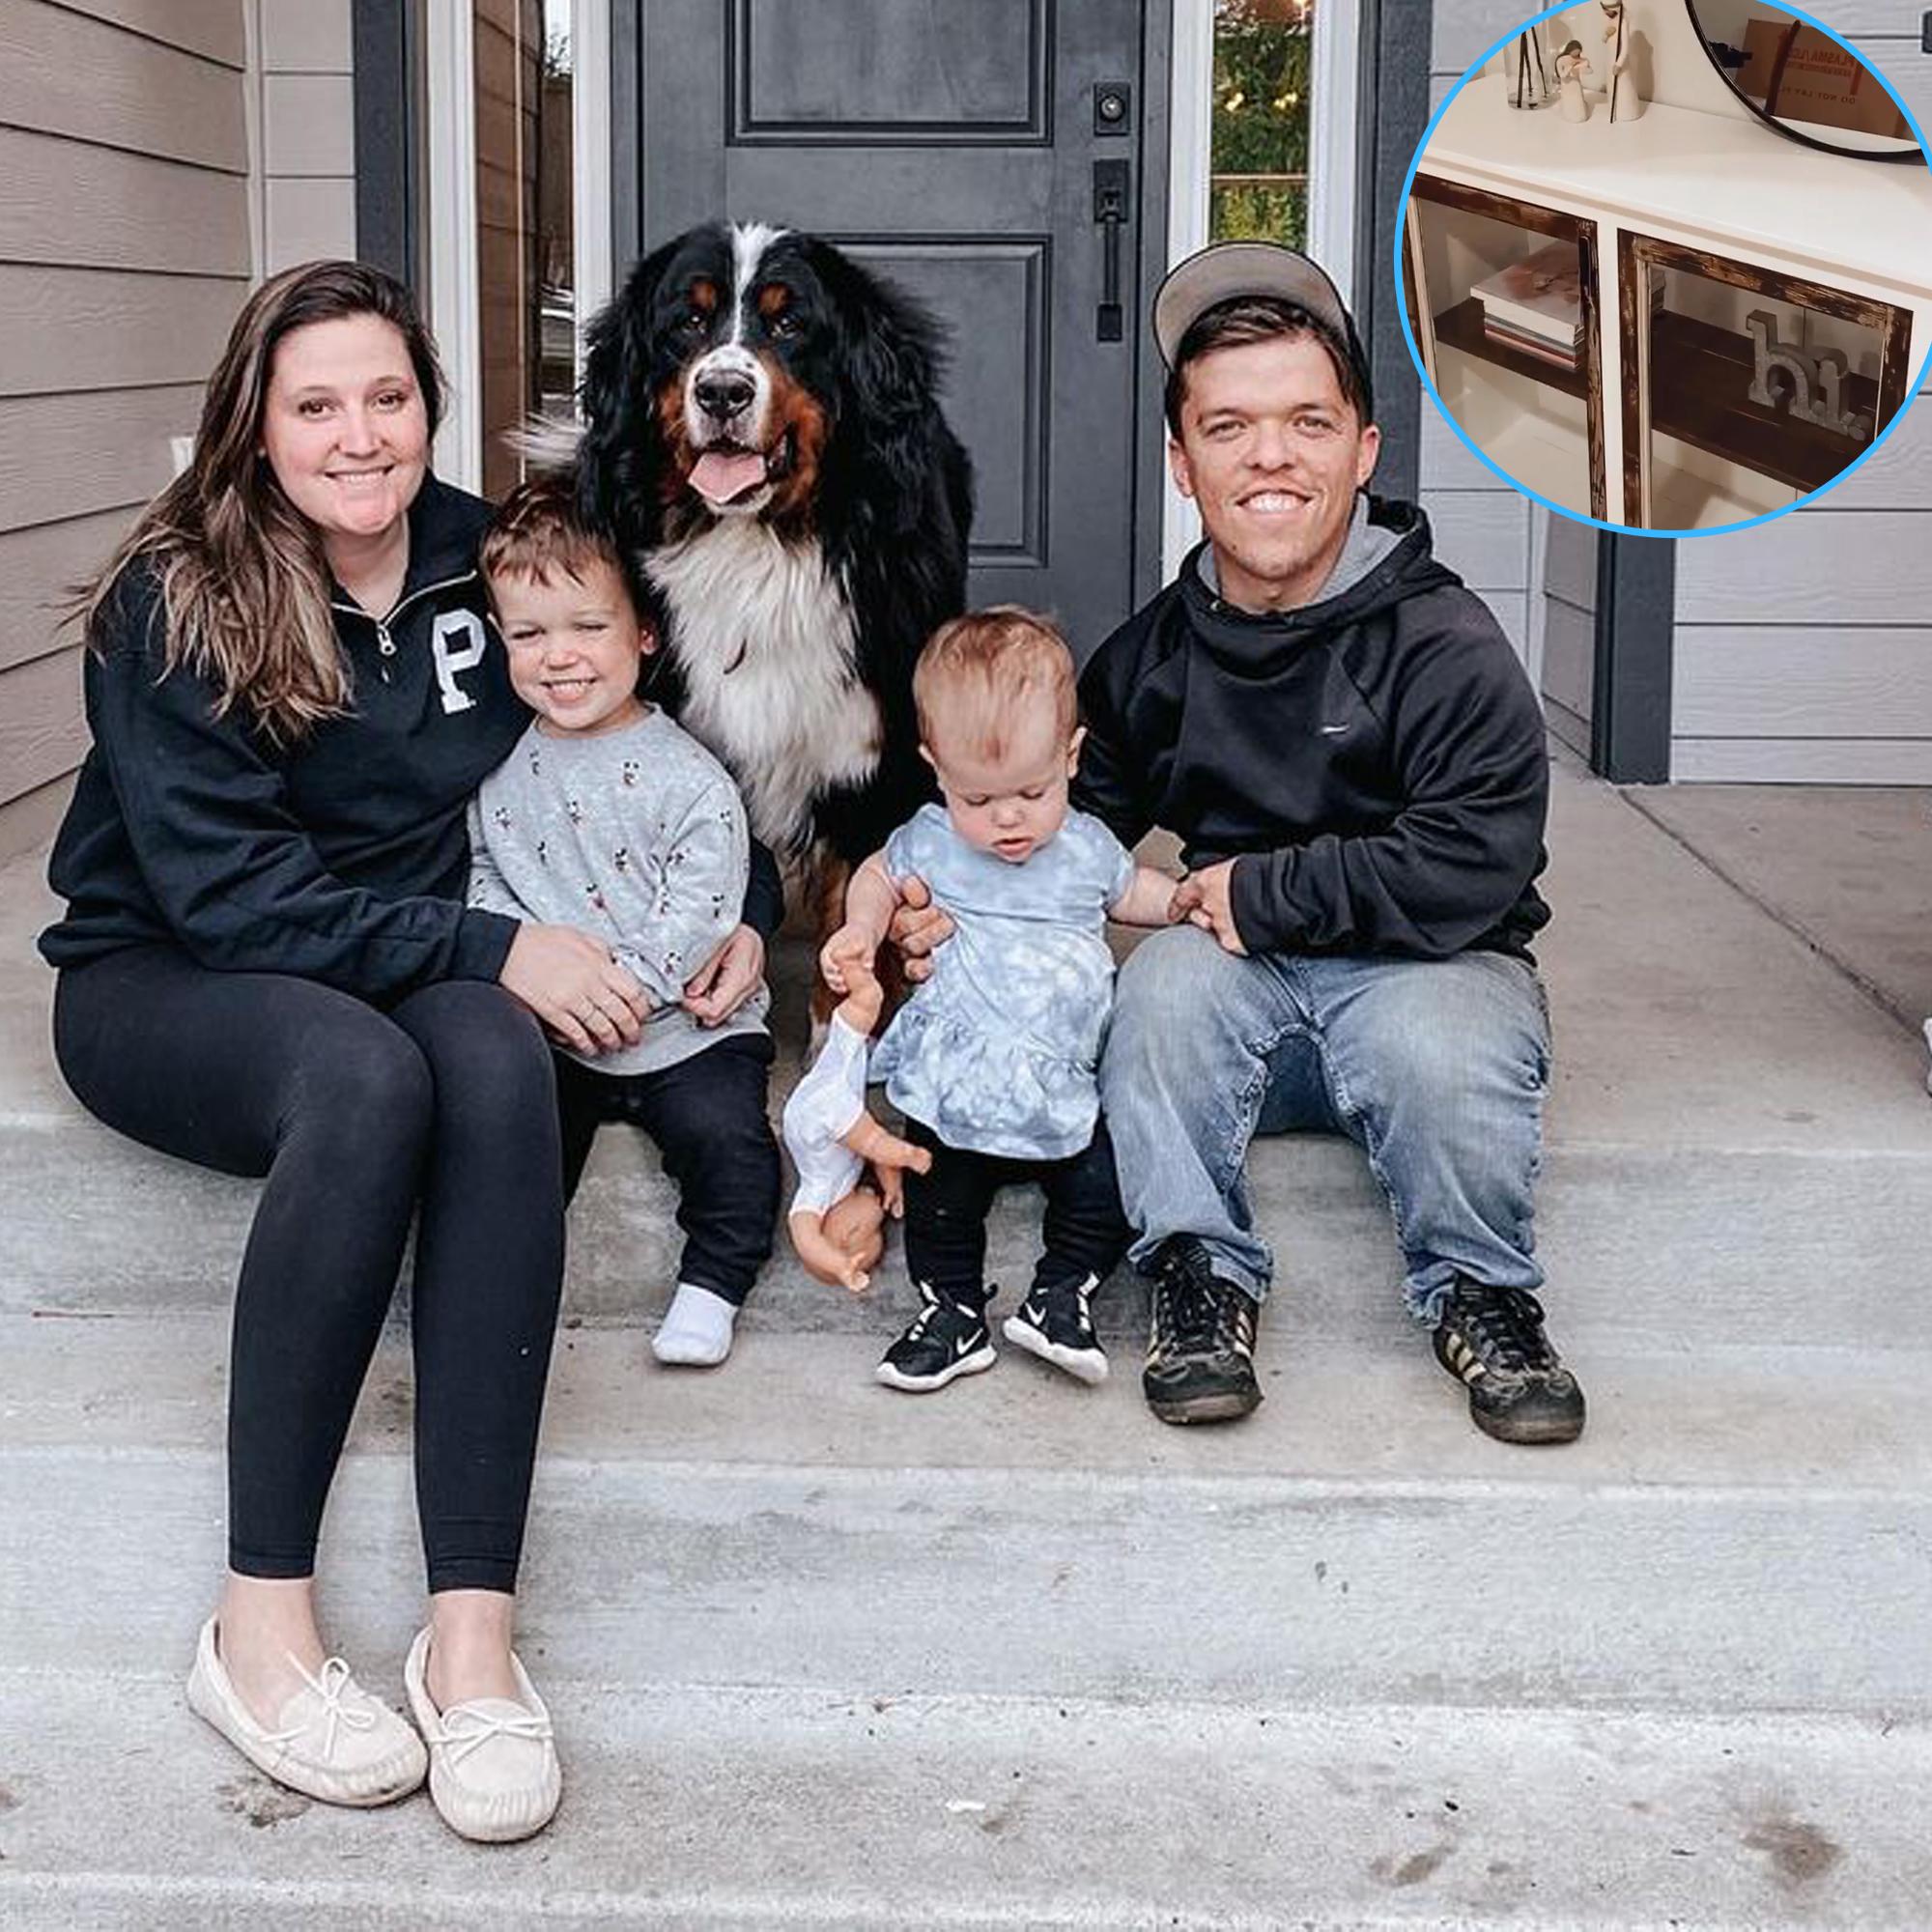 Little People, Big World's Tori Roloff Shows Off New Rustic Decor in Washington Home